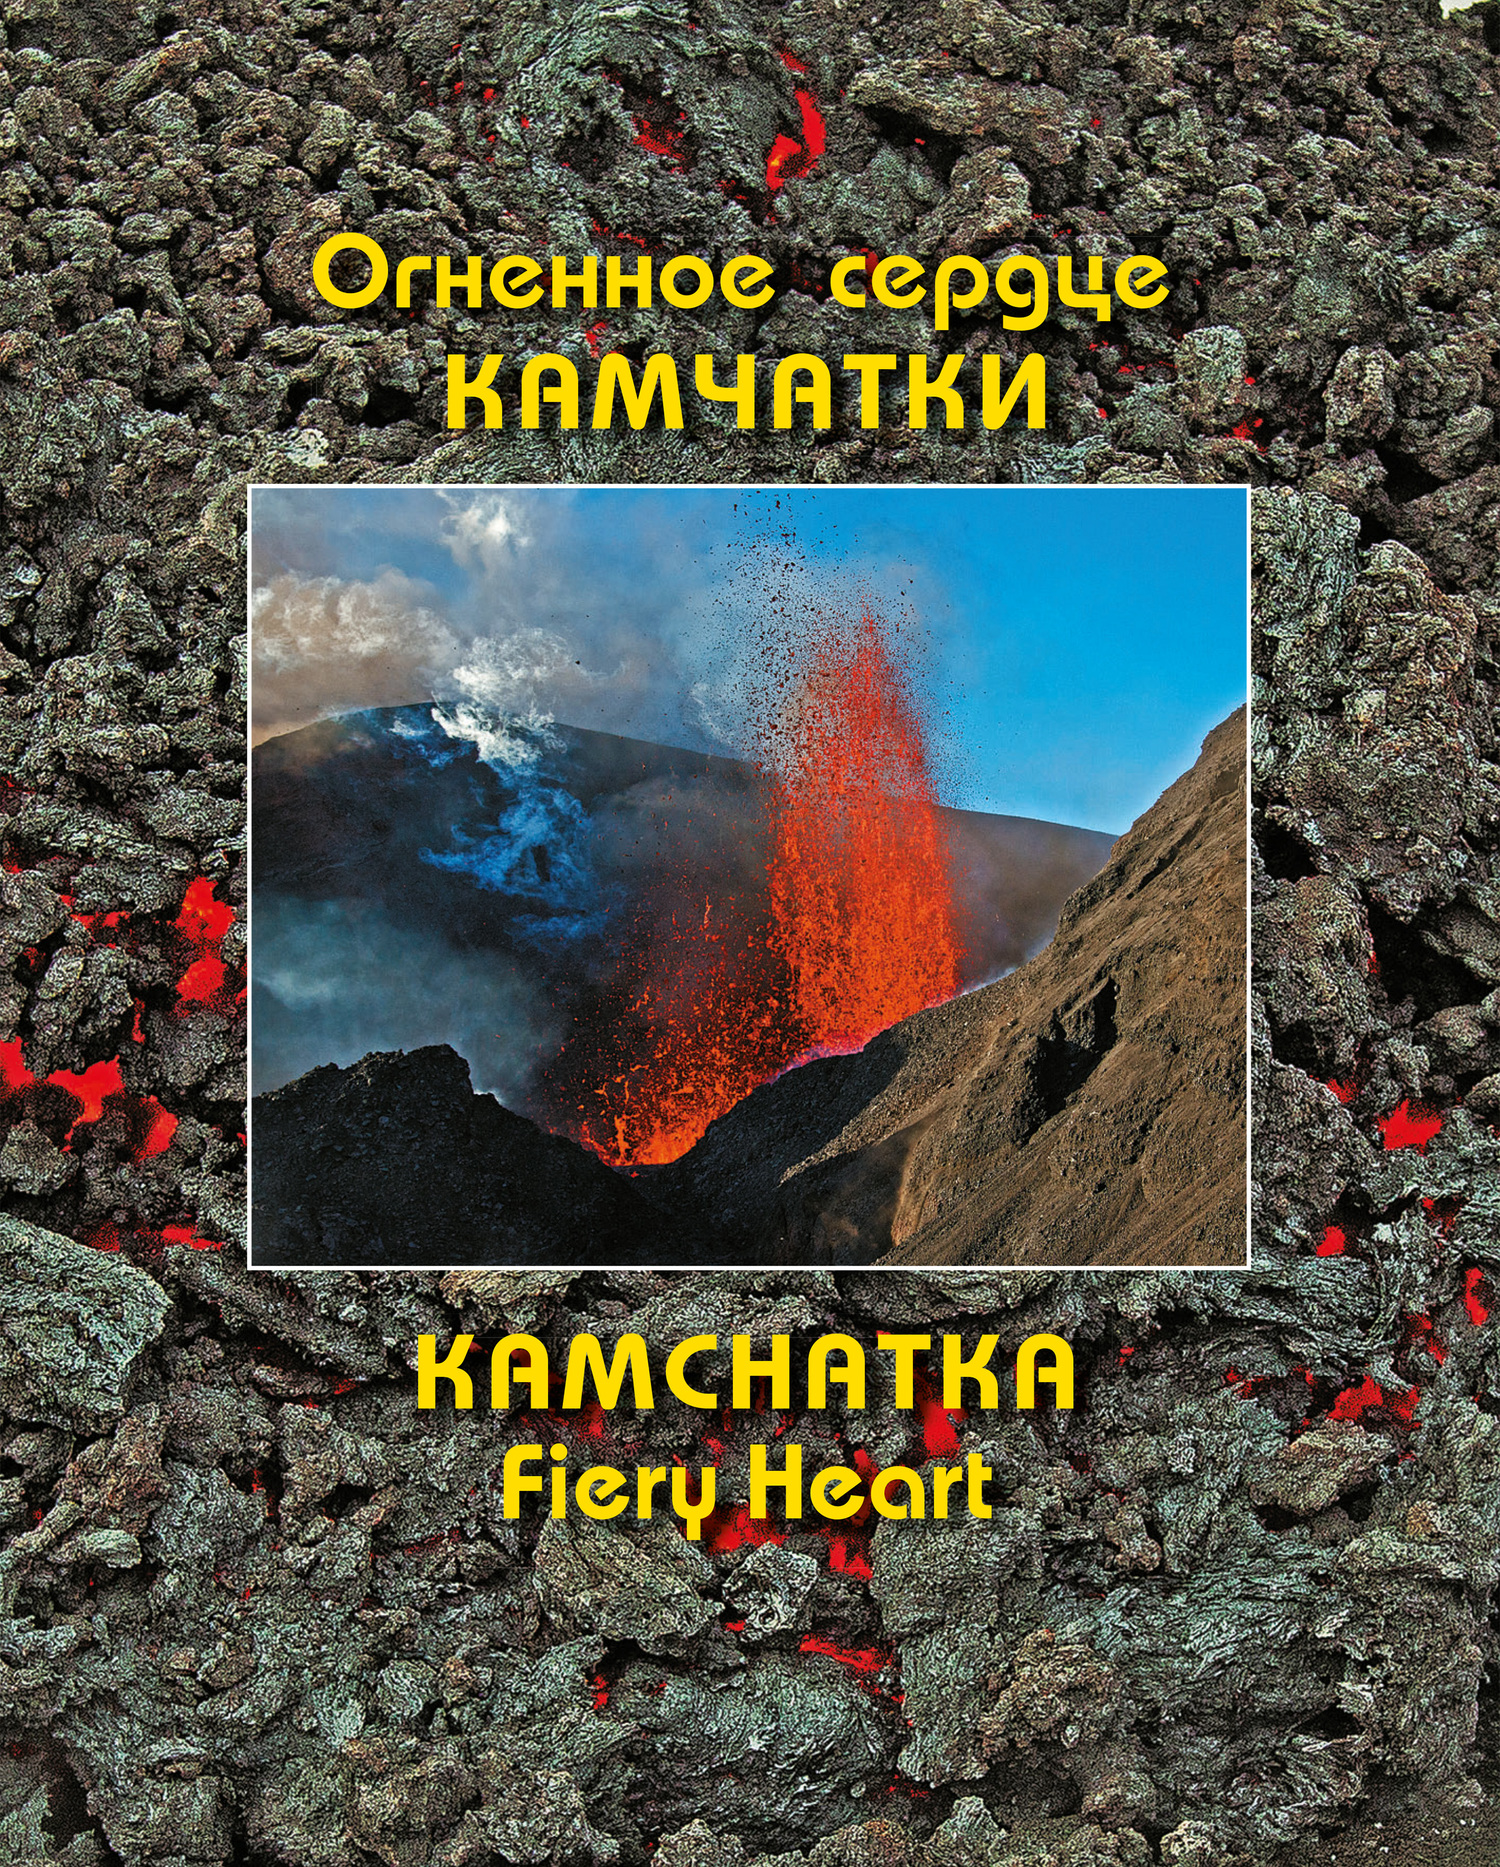 Андрей Нечаев Огненное сердце Камчатки / Kamchatka Fiery Heart